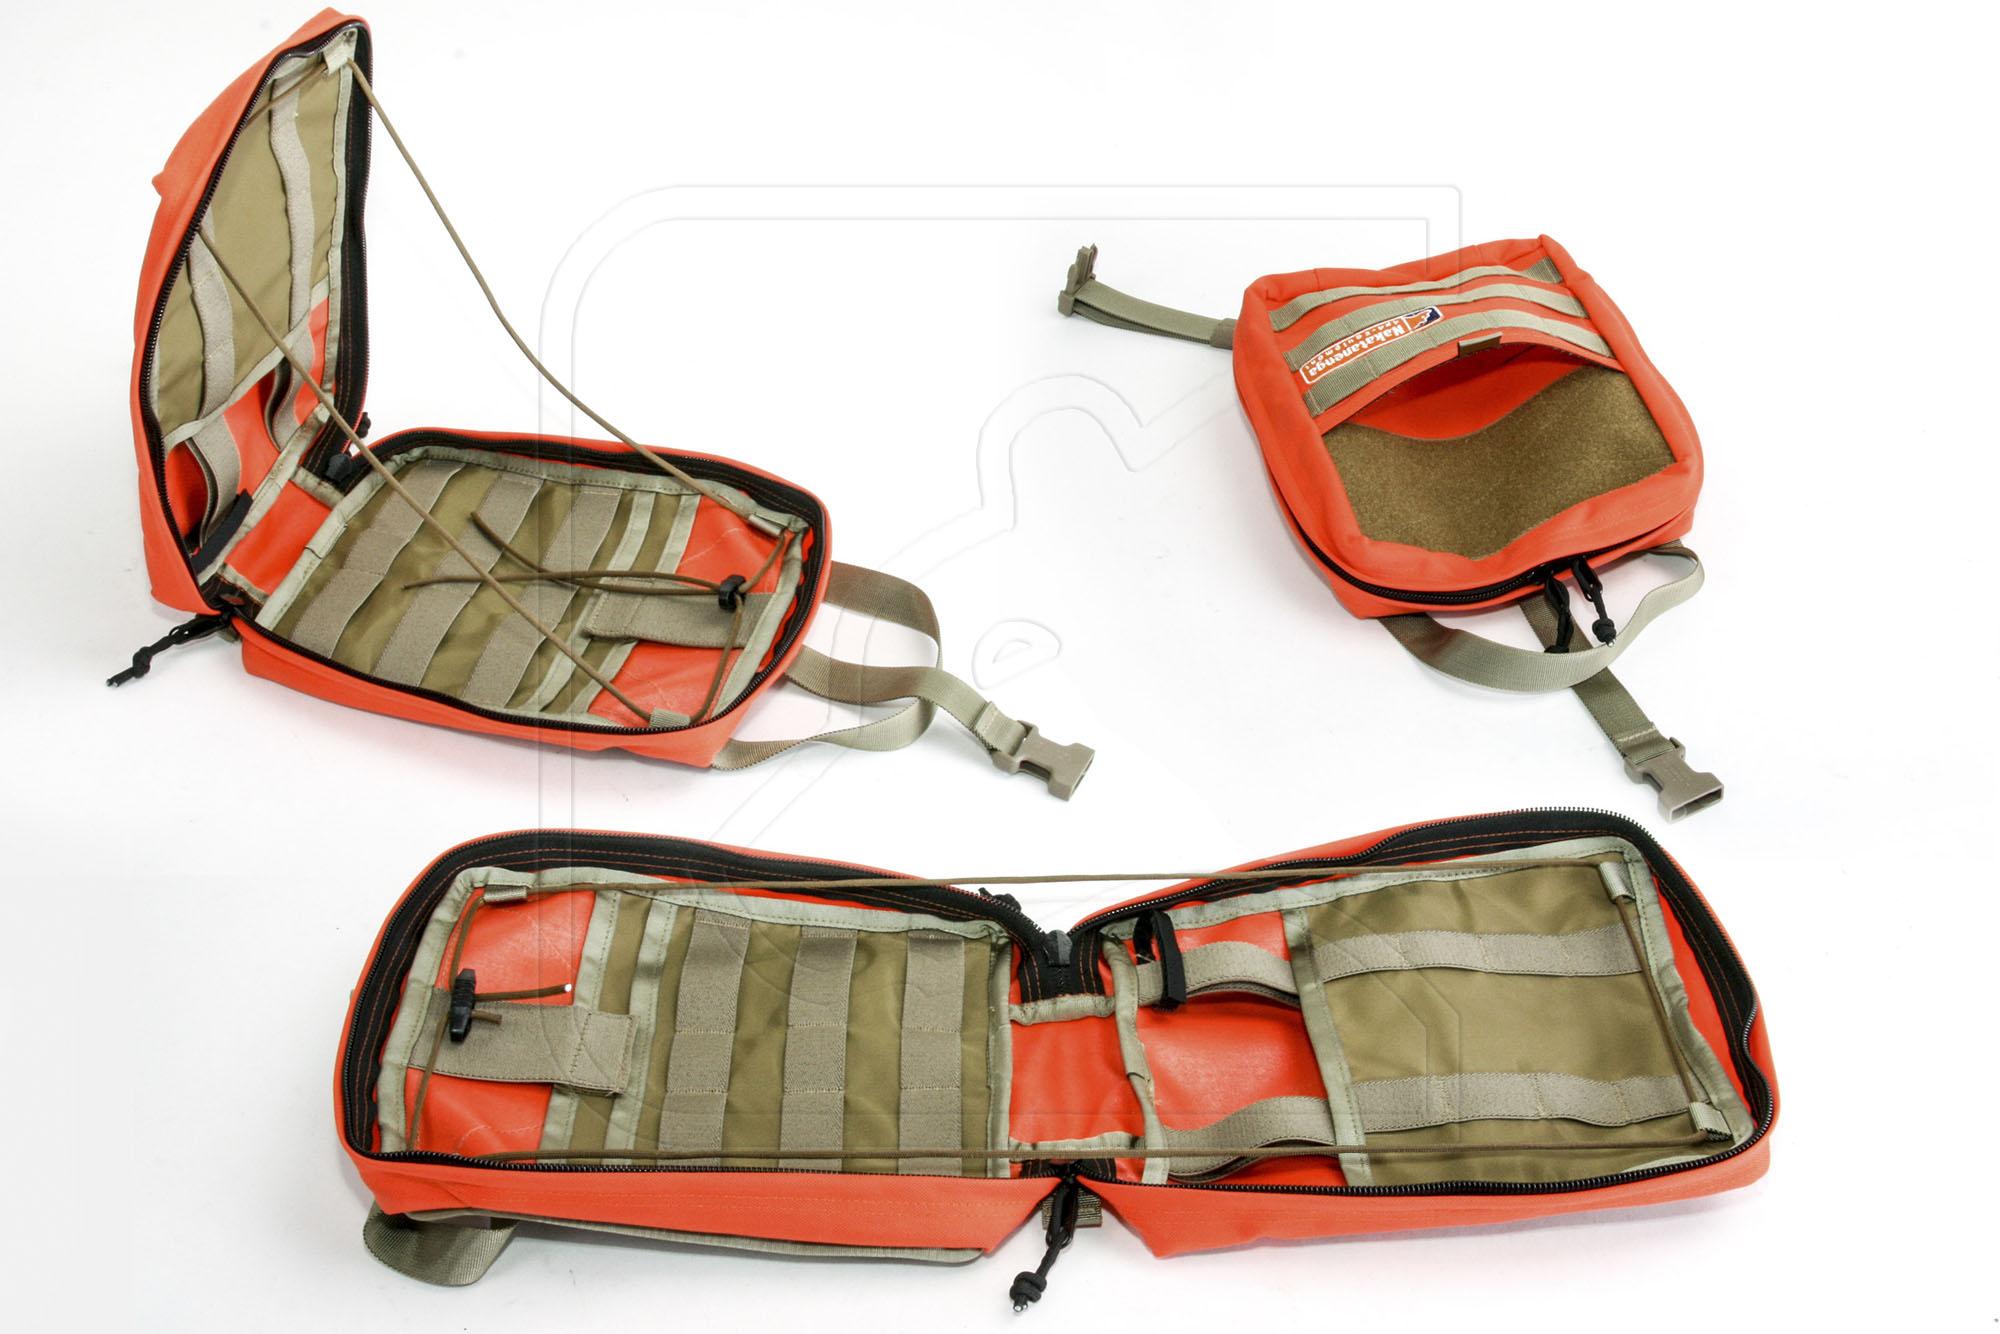 Nakatanenga Große Erste Hilfe Tasche Notfallmedizin Outdoor